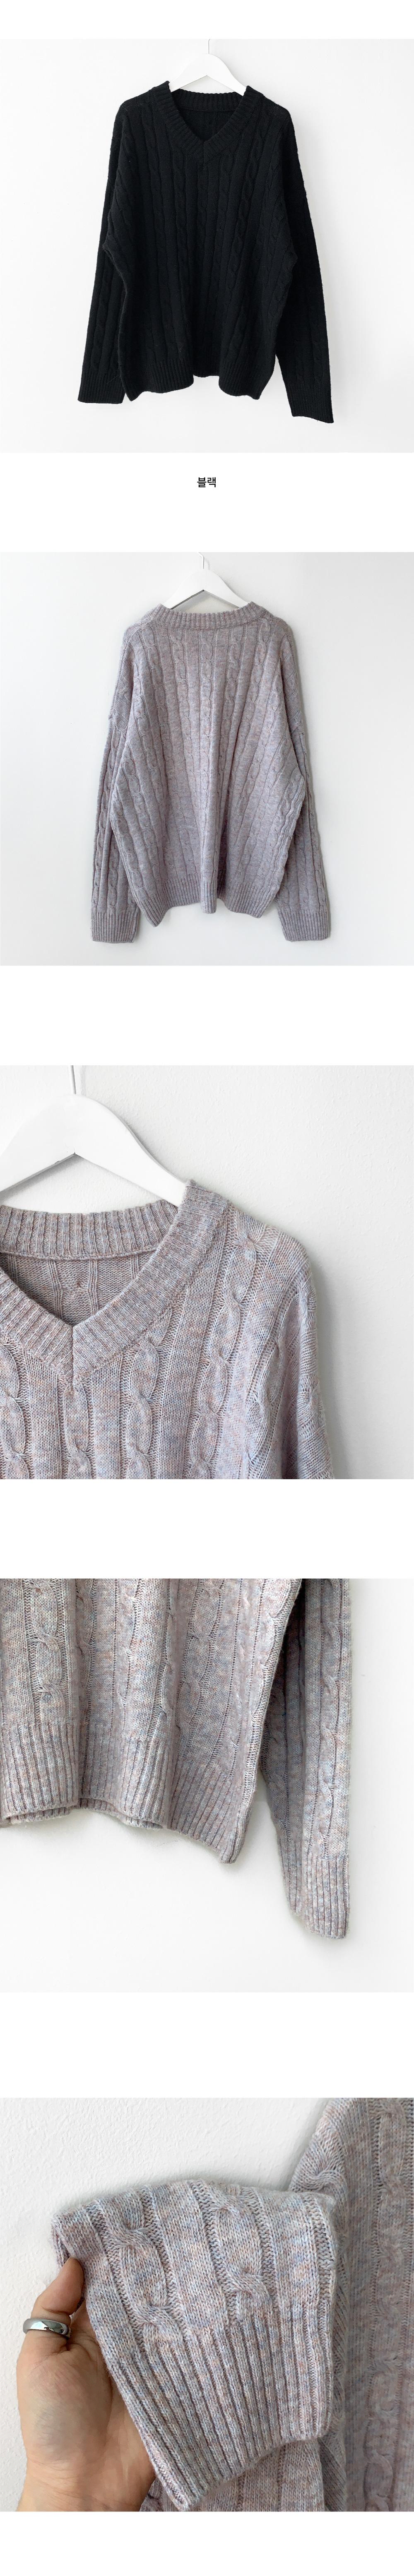 Milky Loose-fit V-Neck Twisted Knitwear